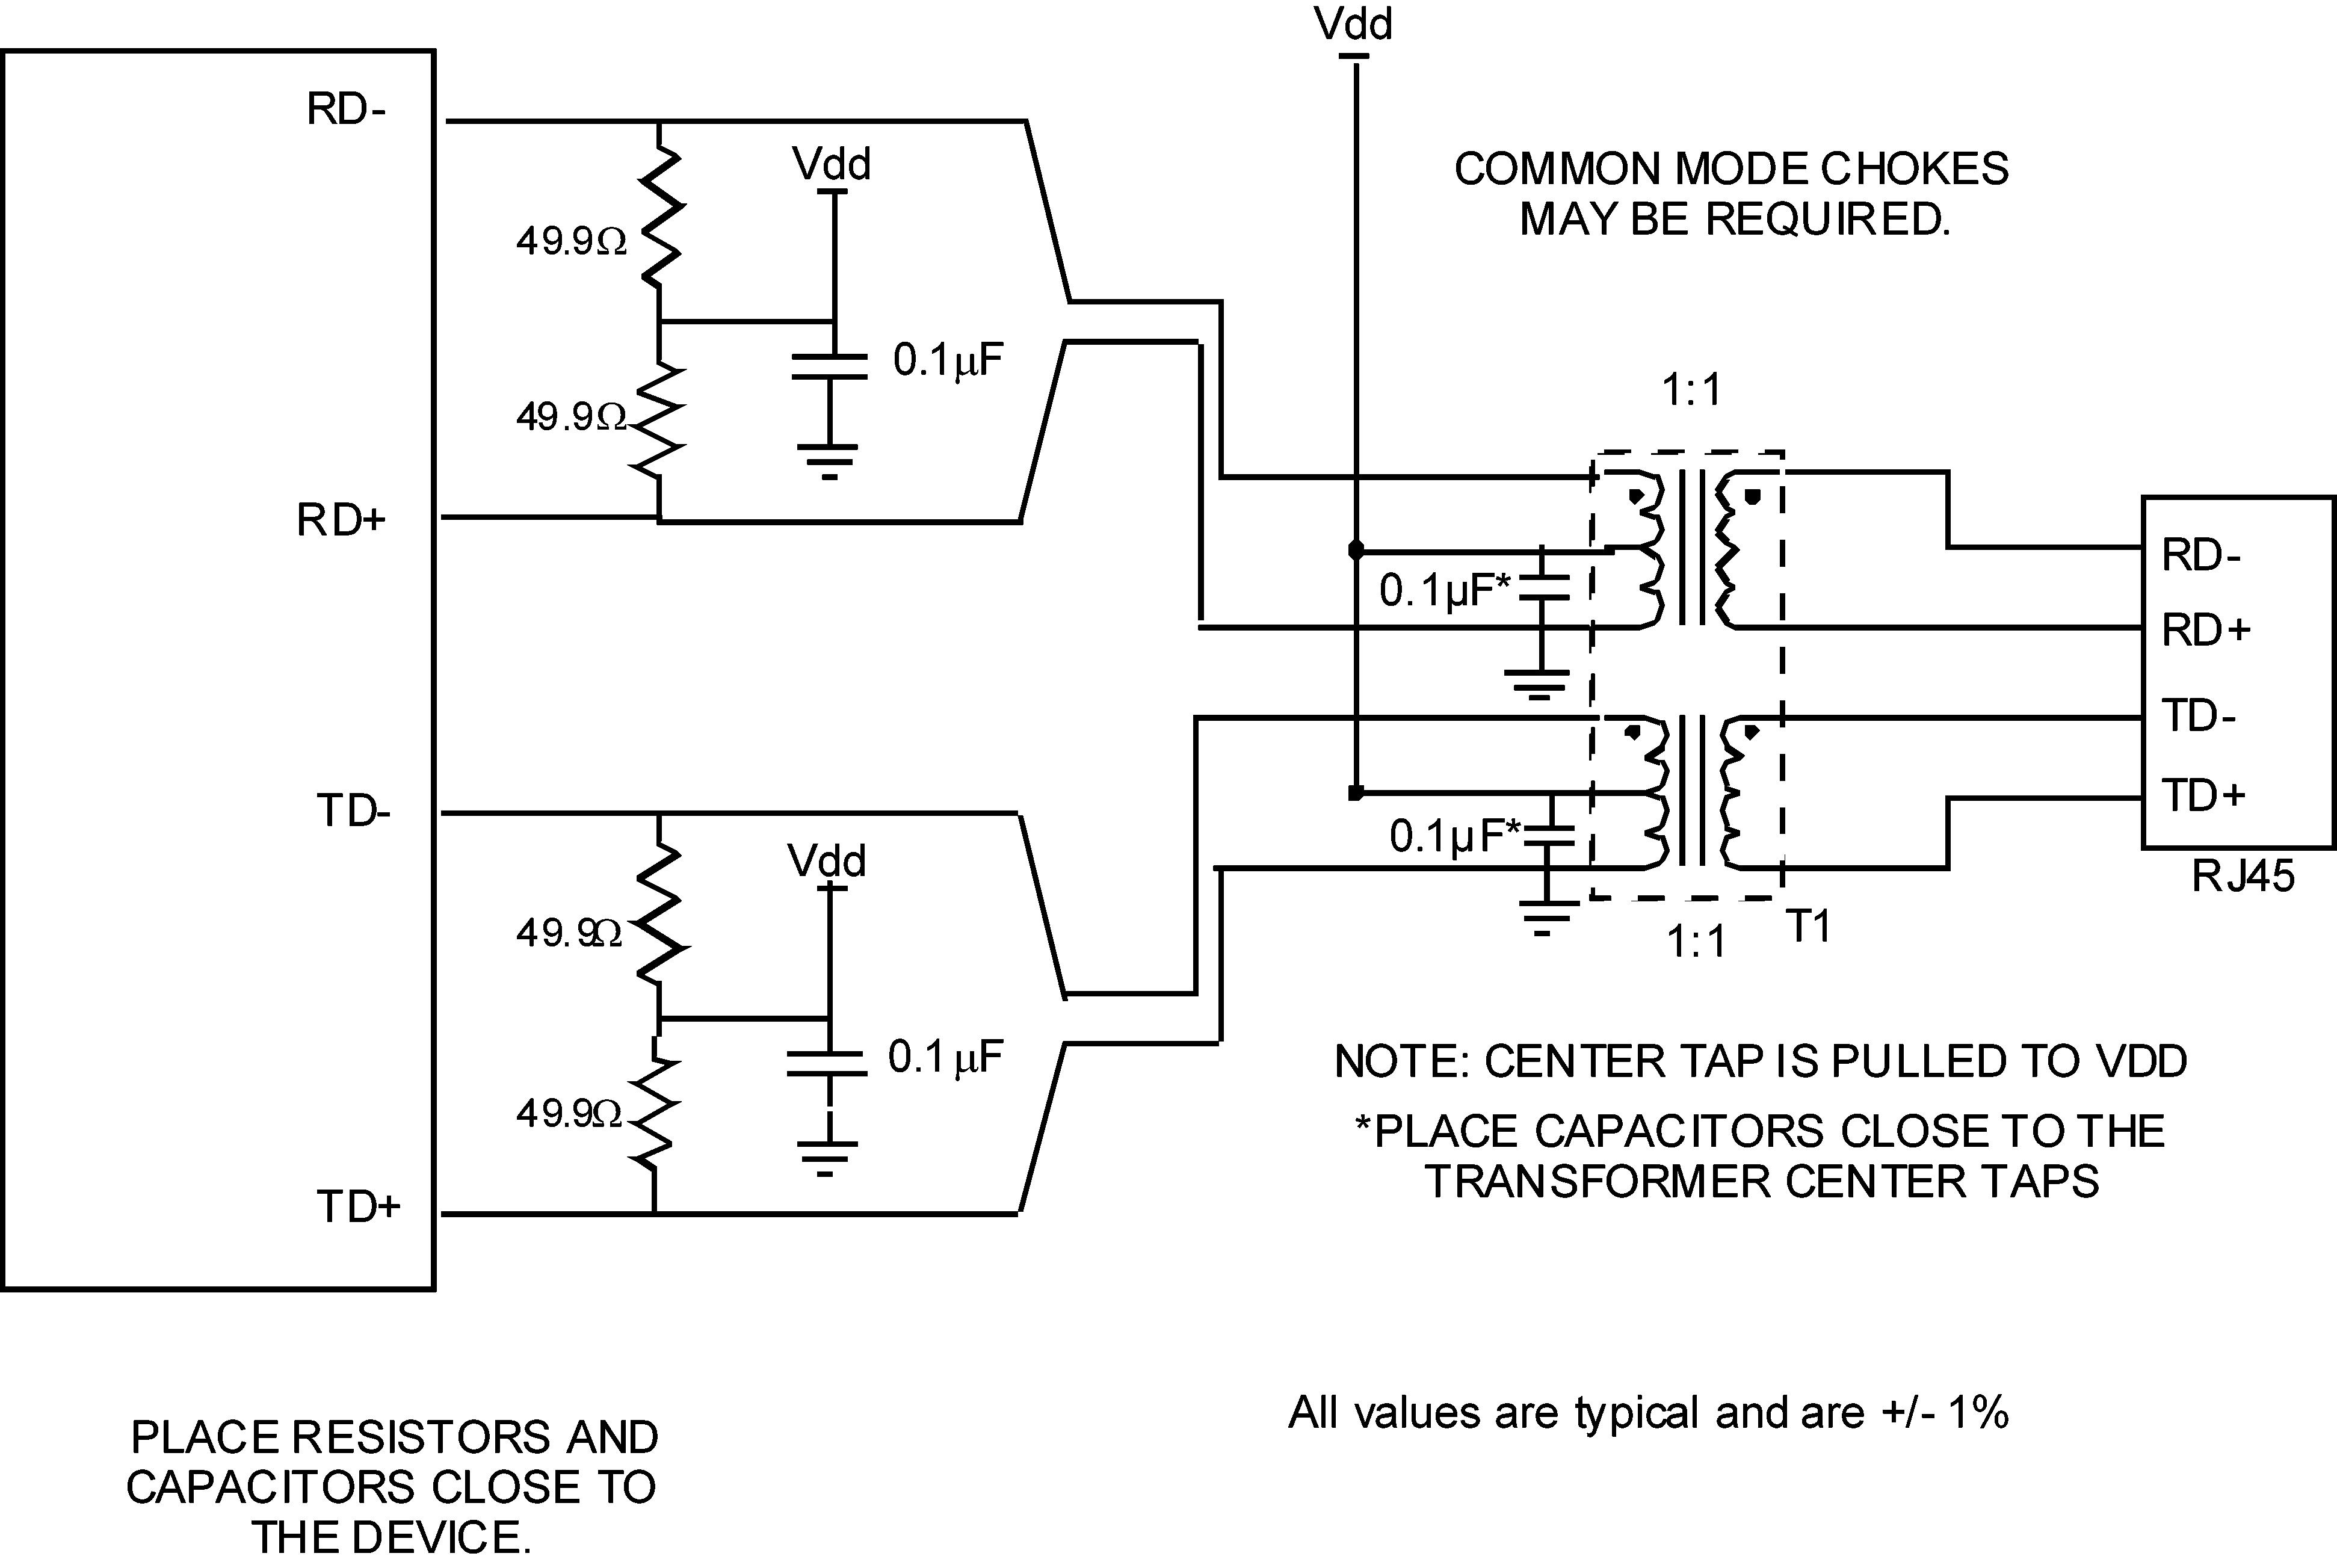 10100 ethernet wiring diagram basic guide wiring diagram u2022 rh needpixies com Cat 6 Wiring Diagram RJ45 Ethernet Connector Wiring Diagram